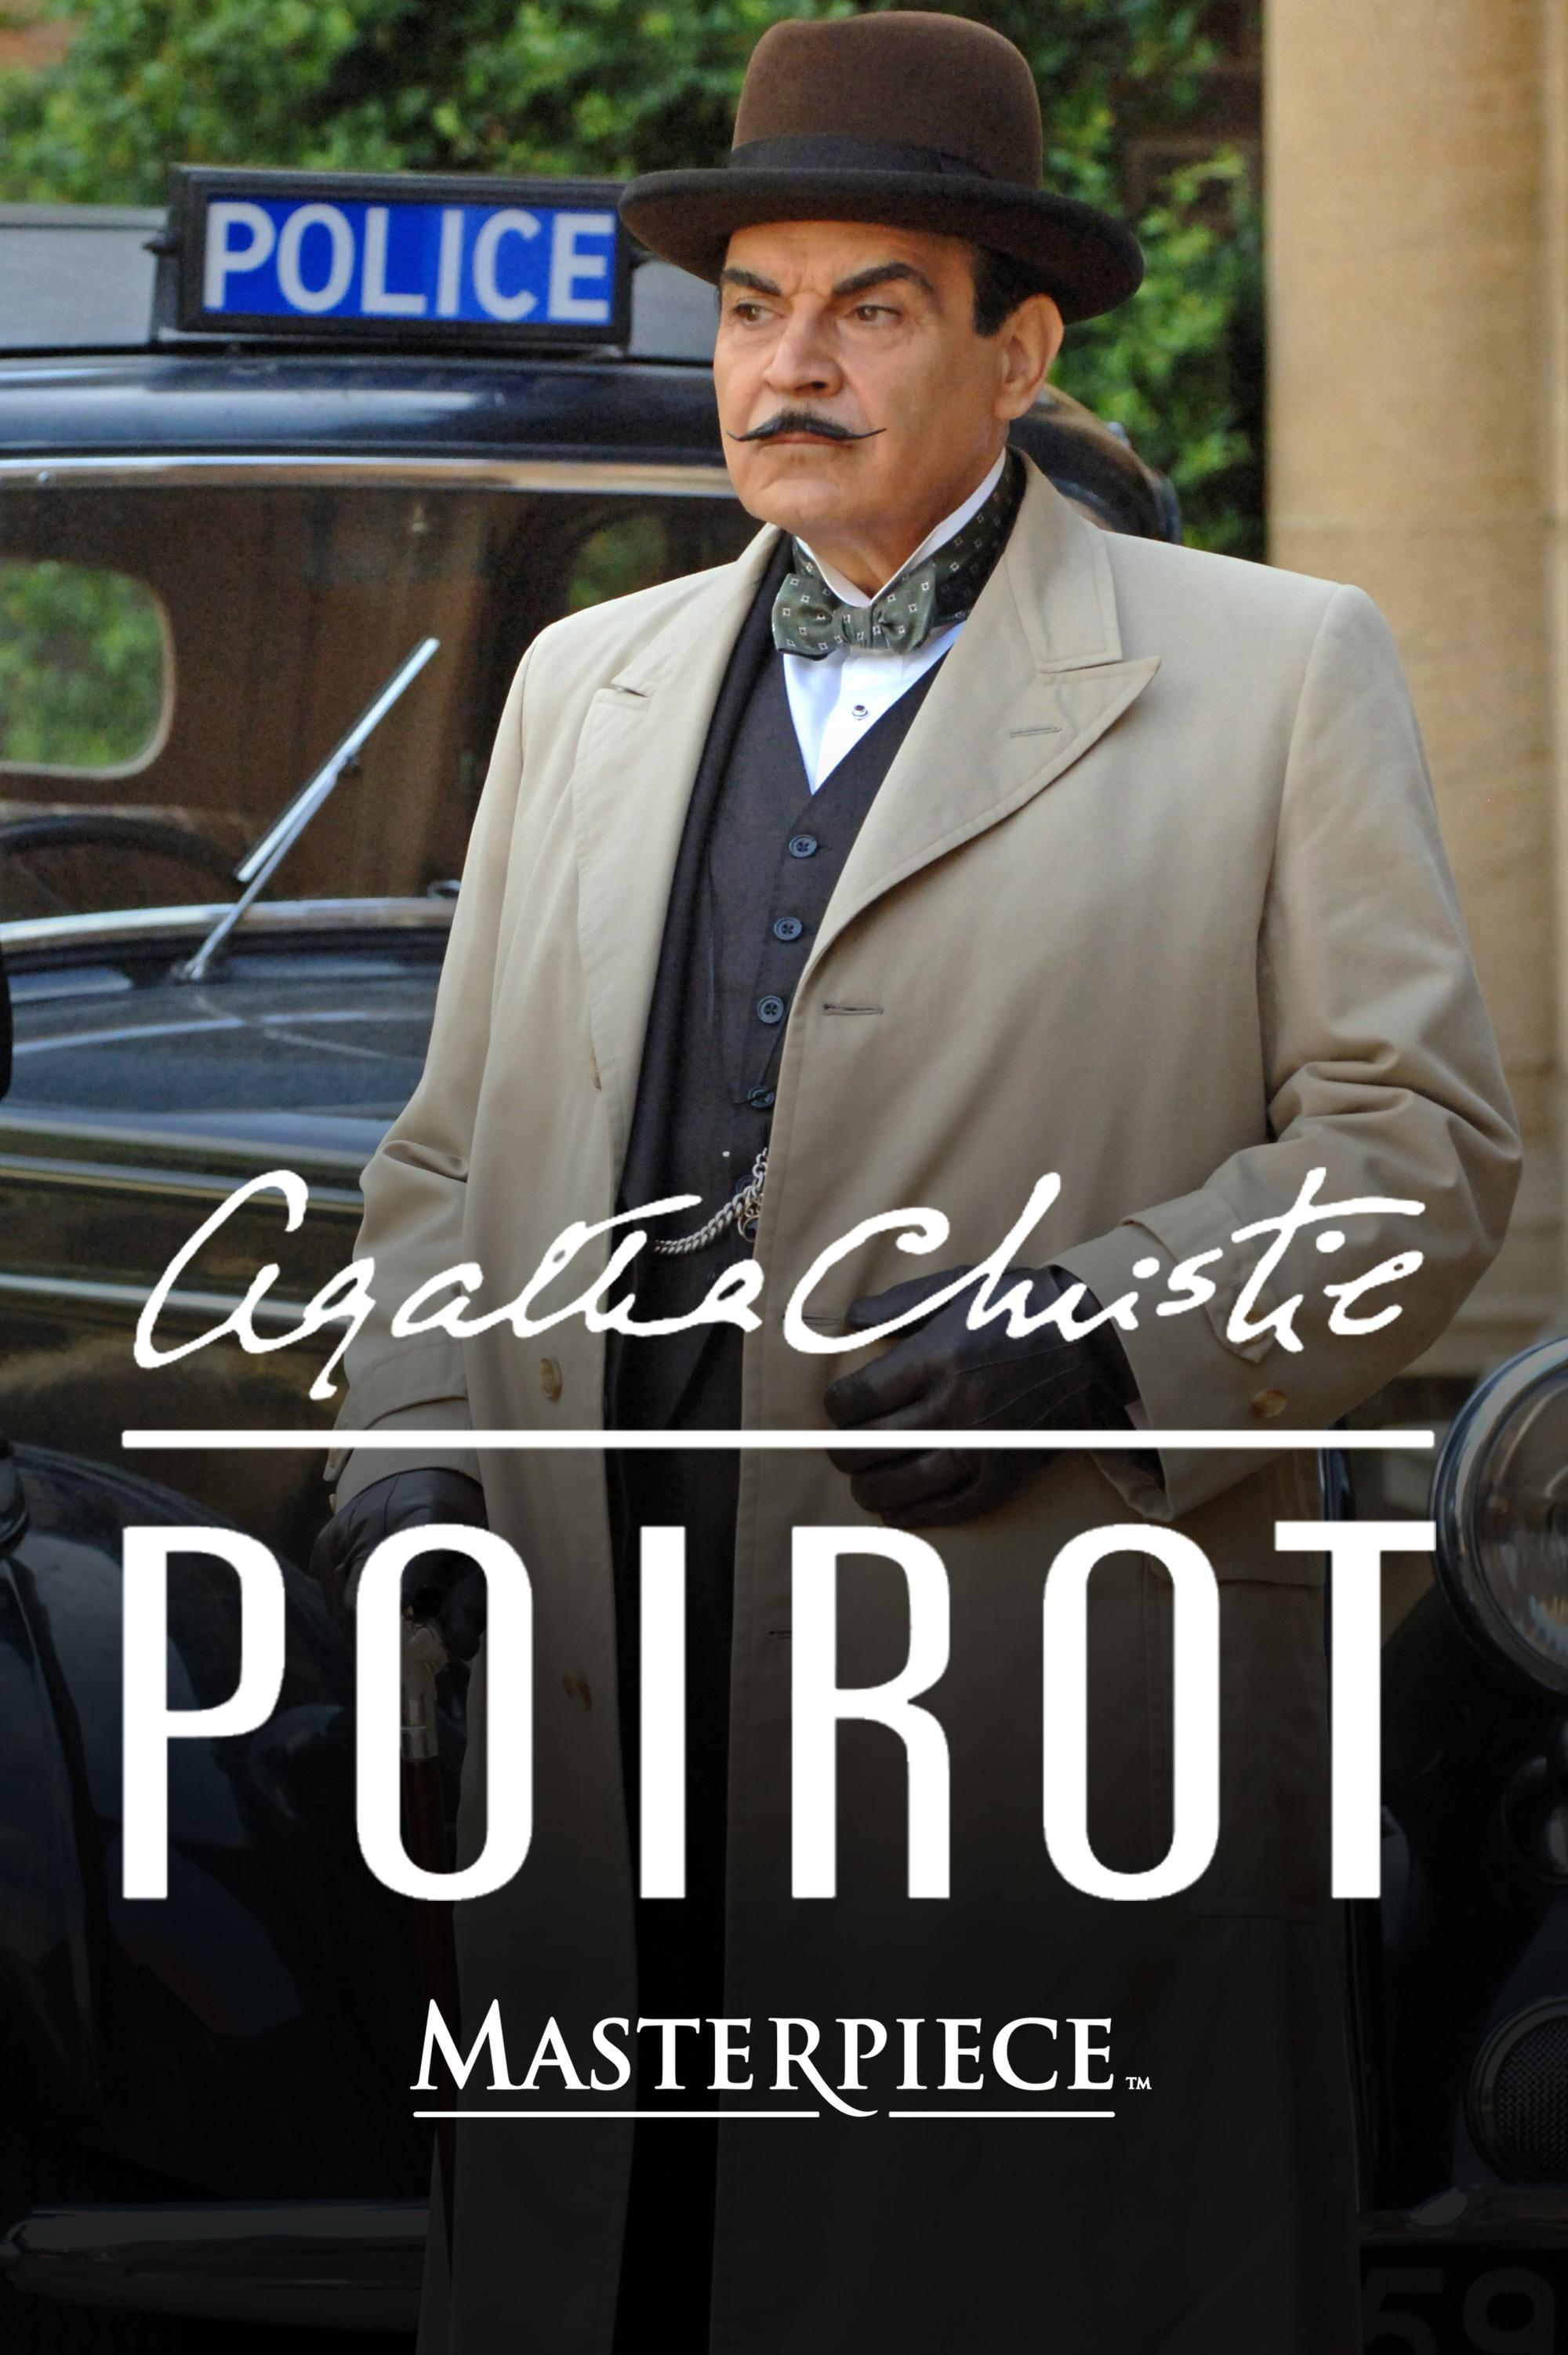 Hercule Poirot - Masterpiece | Video | THIRTEEN - New York Public ...